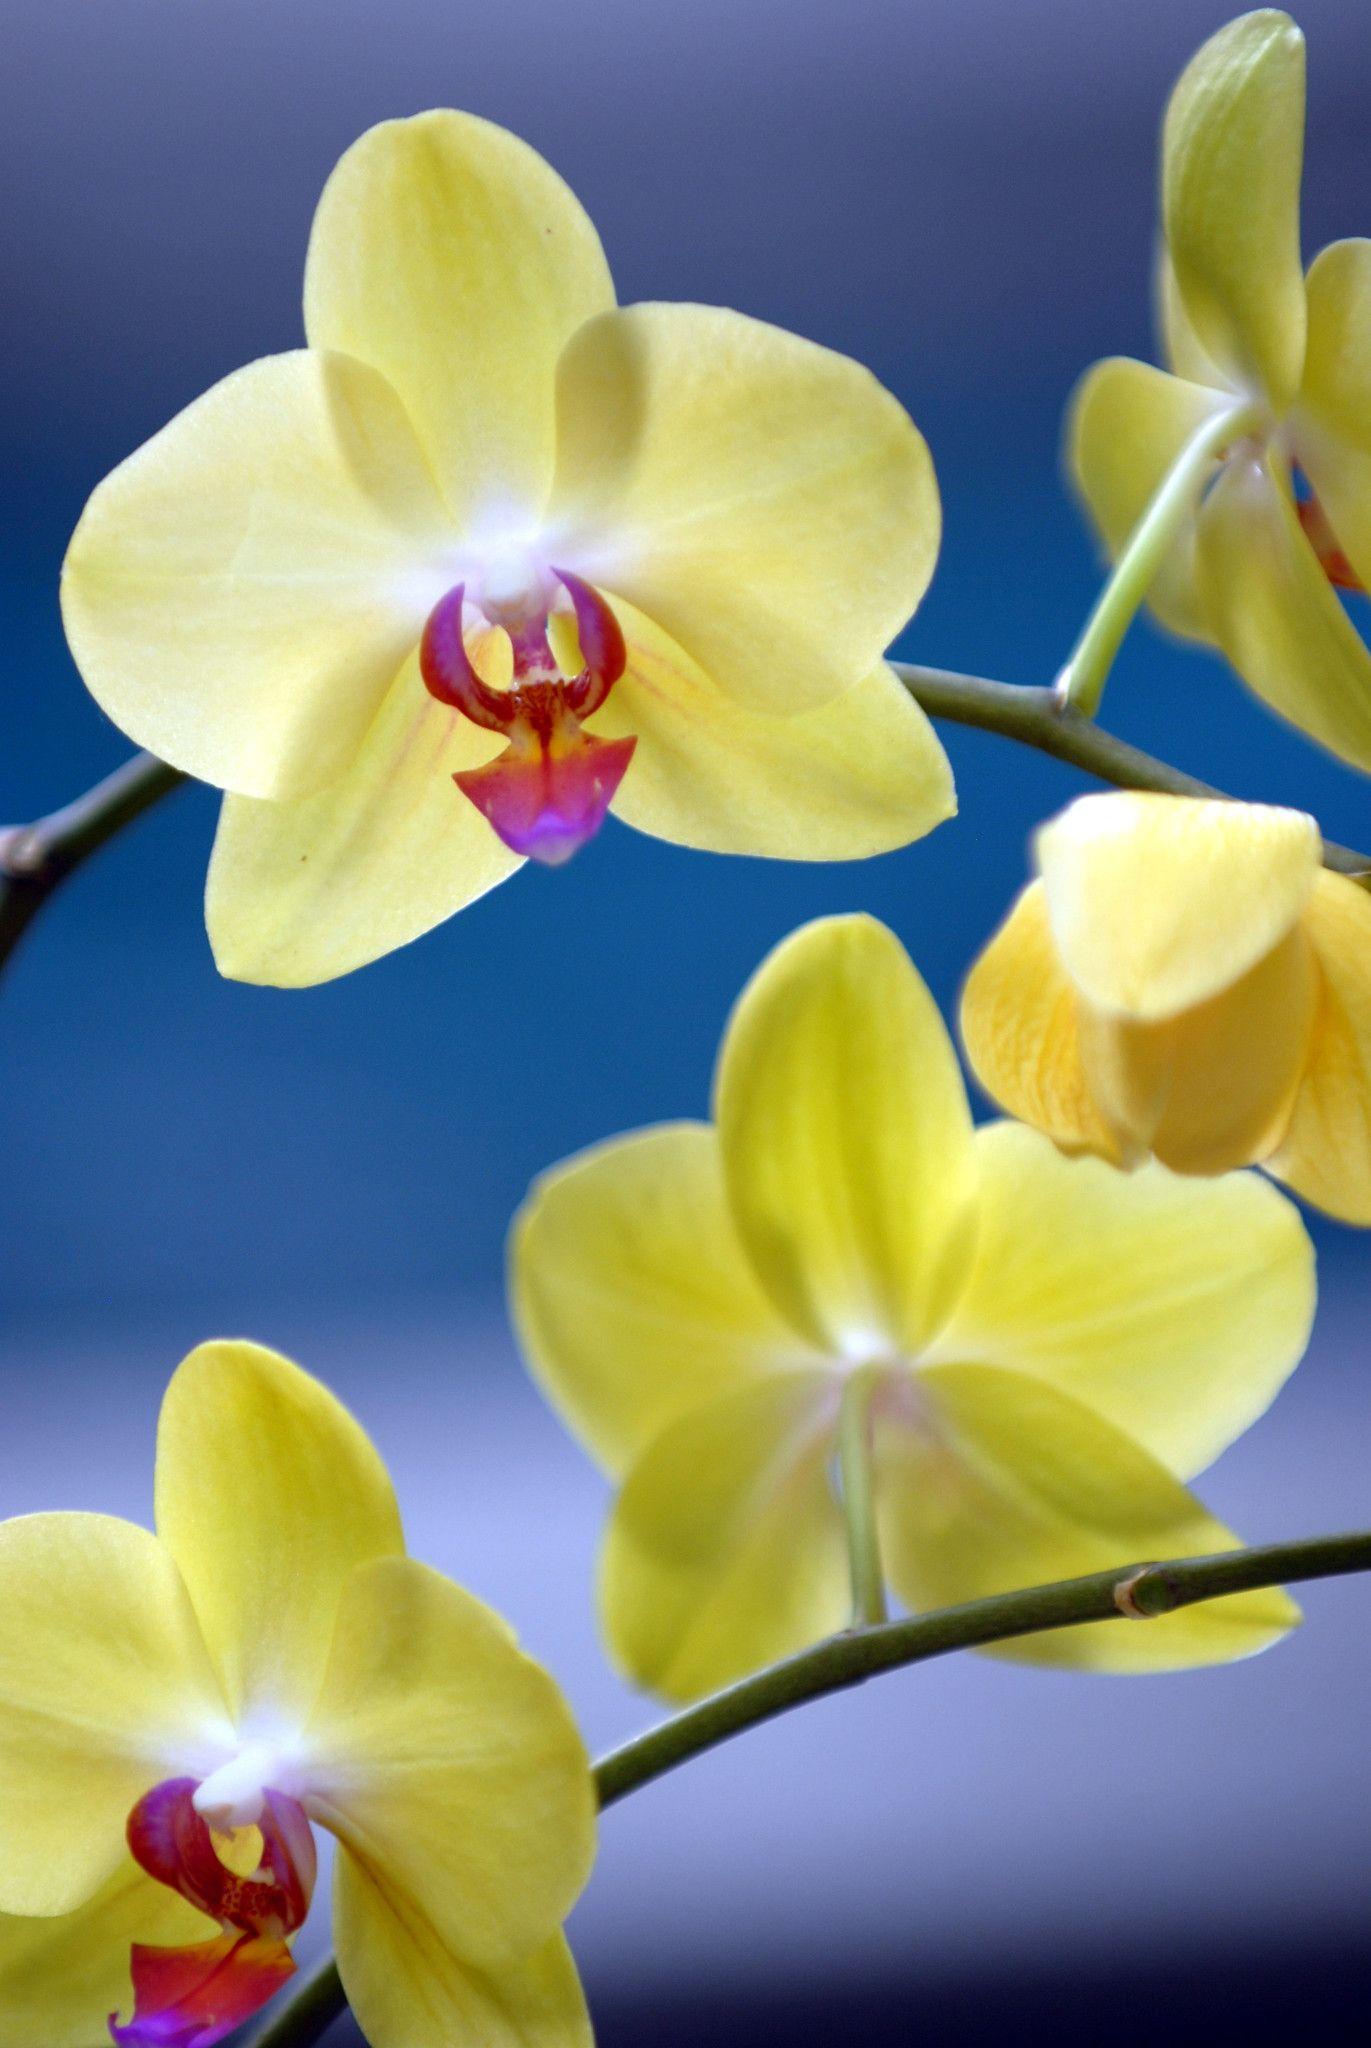 Orchids Amazing Flowers Flower Wallpaper Orchids Fantastic orchid flower wallpaper